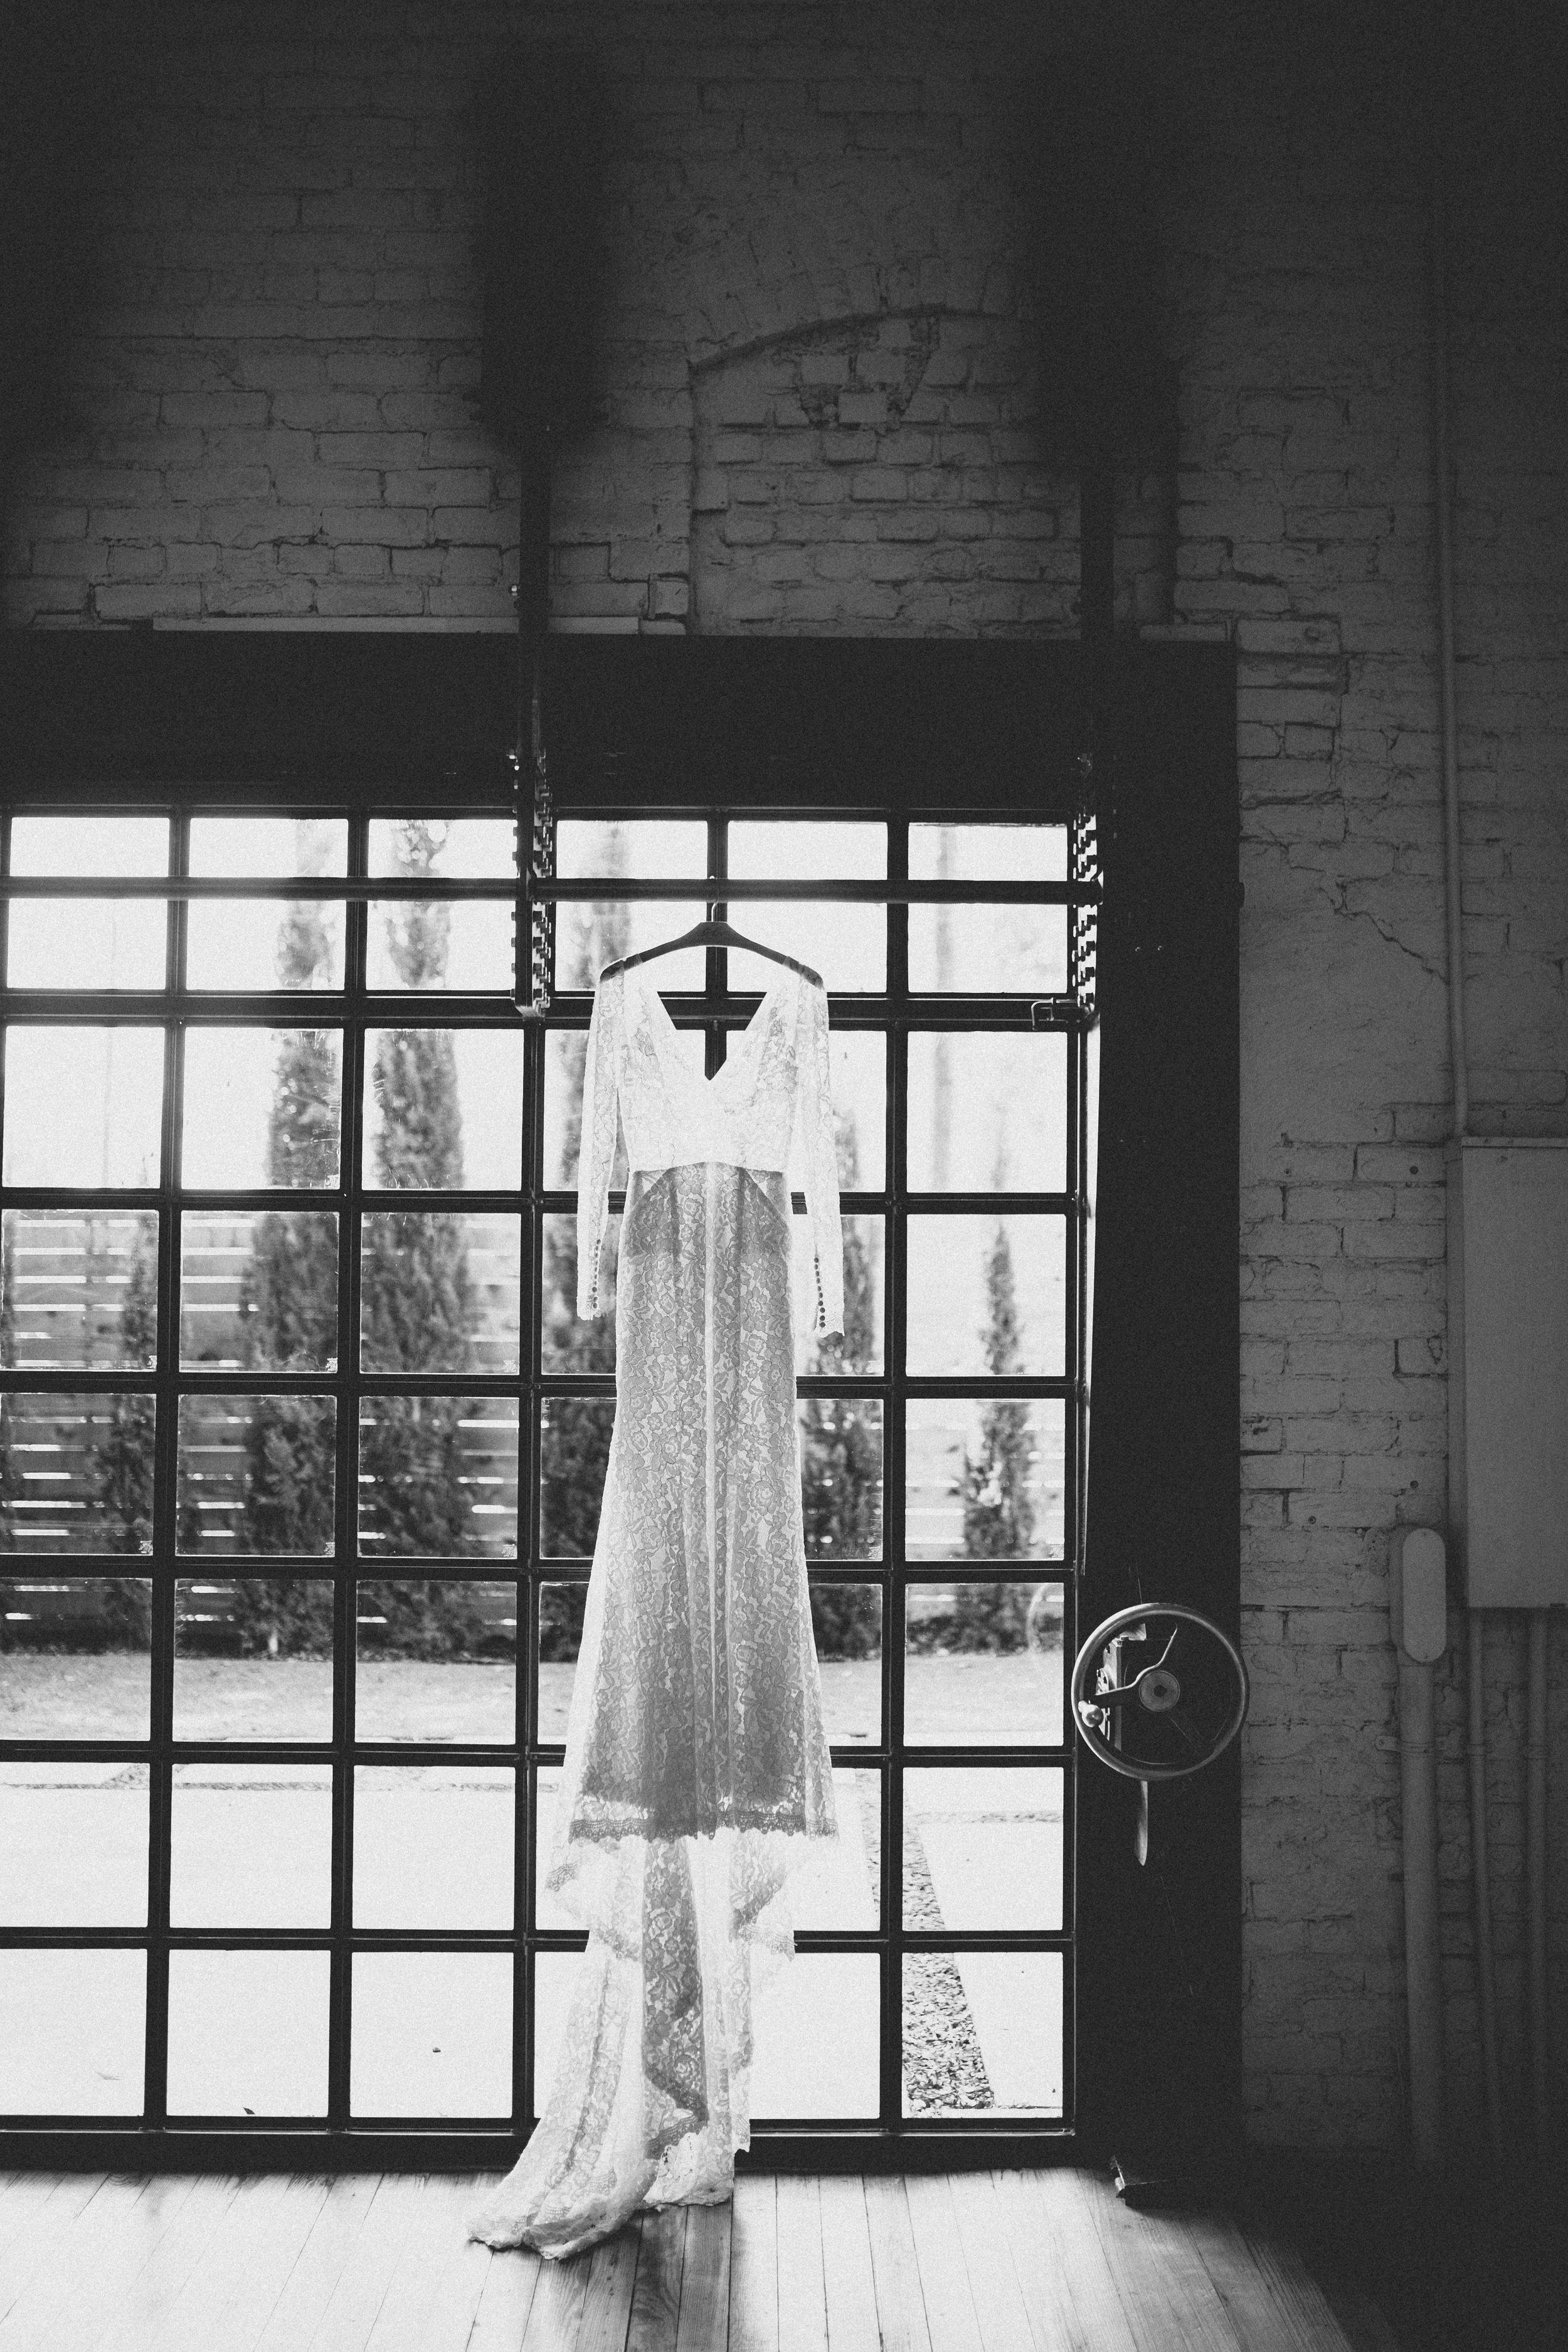 stephanie-hanson-photography-new-york-city-san-antonio-wedding-photographer-stephanie-hanson-photo-new-york-city-wedding-photographer-stephanie-hanson-nick-hanson-one-eleven-east-hutto